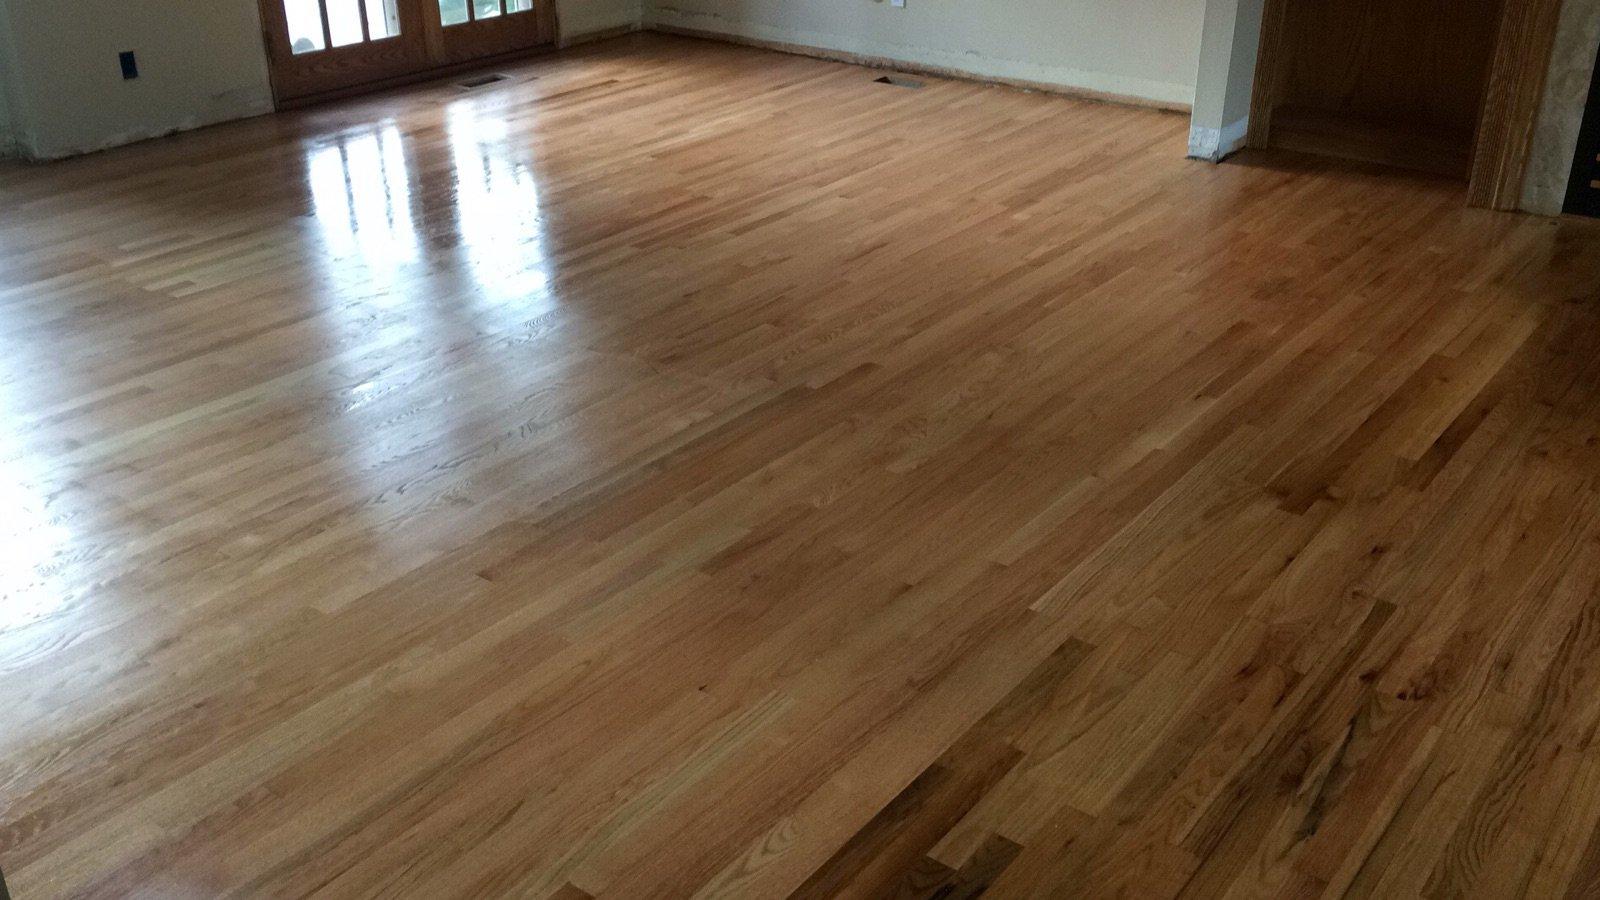 Cramer Hardwood Floors image 9